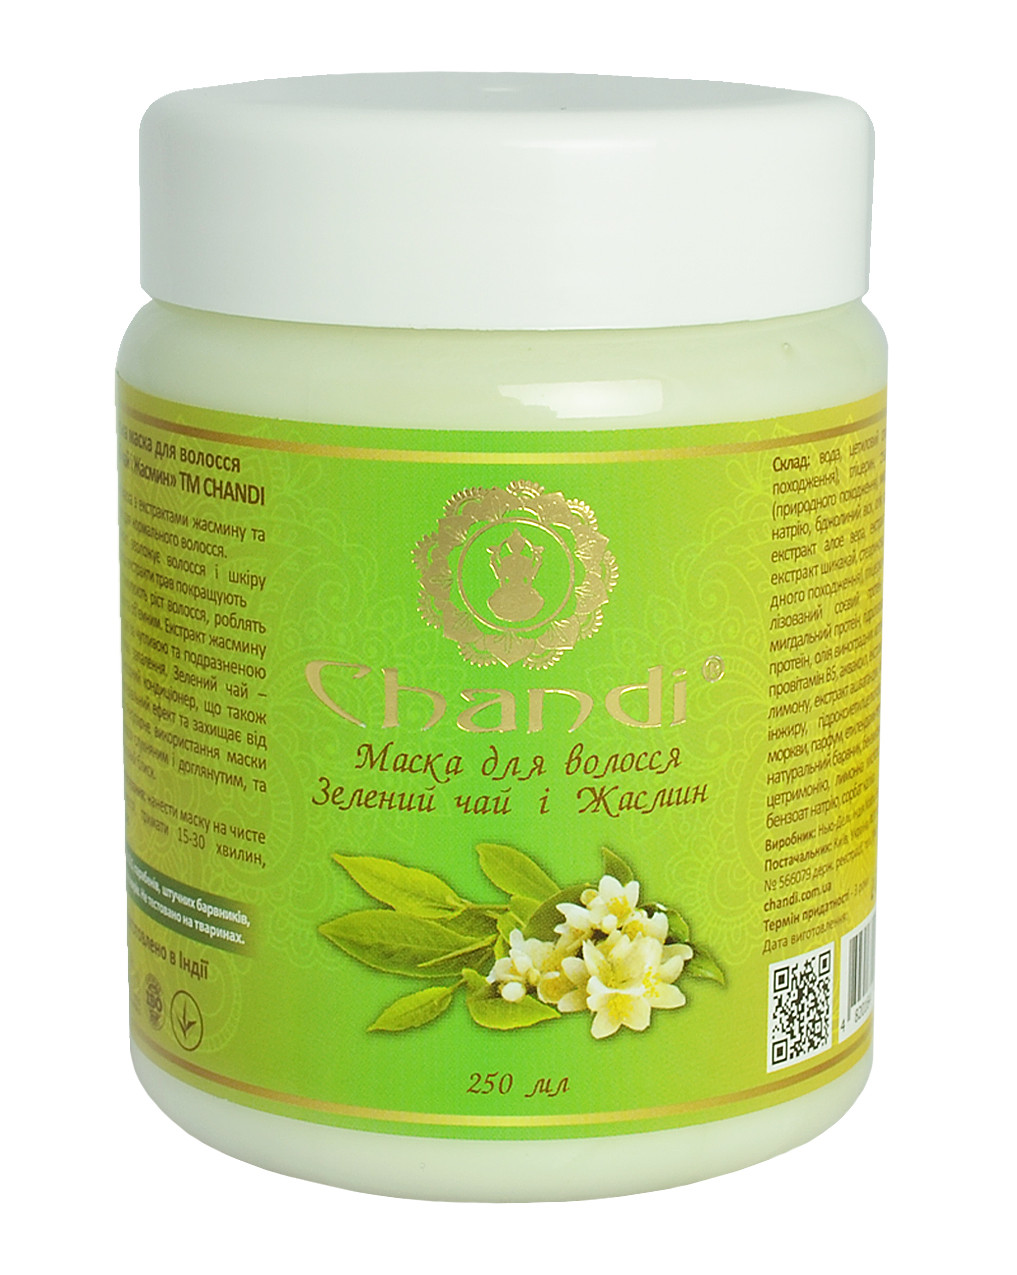 "Маска для волос ""Зеленый чай и Жасмин"" Chandi, 250мл"